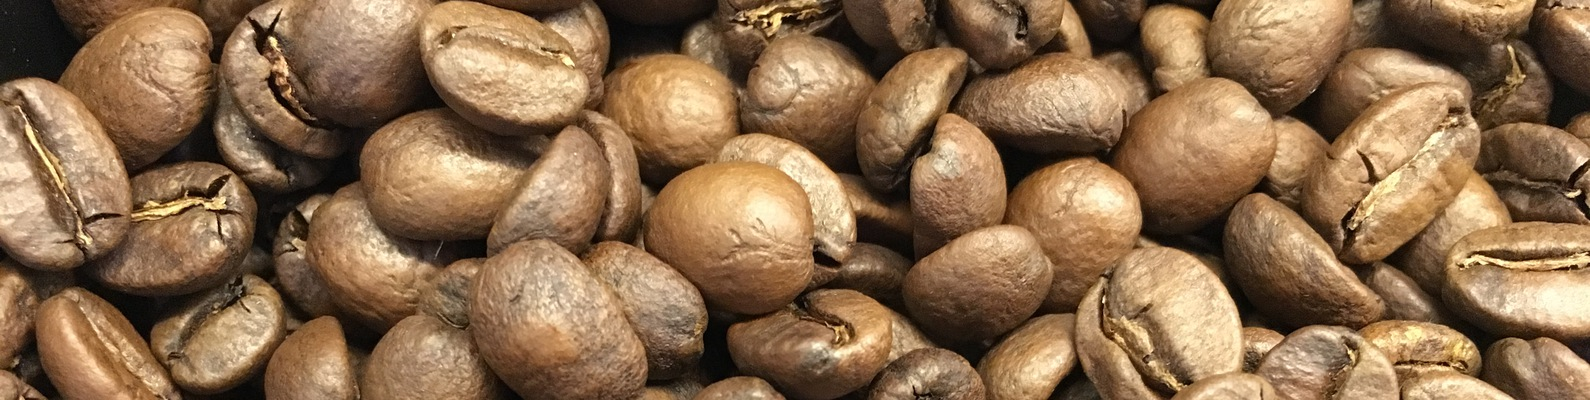 Arabica robusta price difference